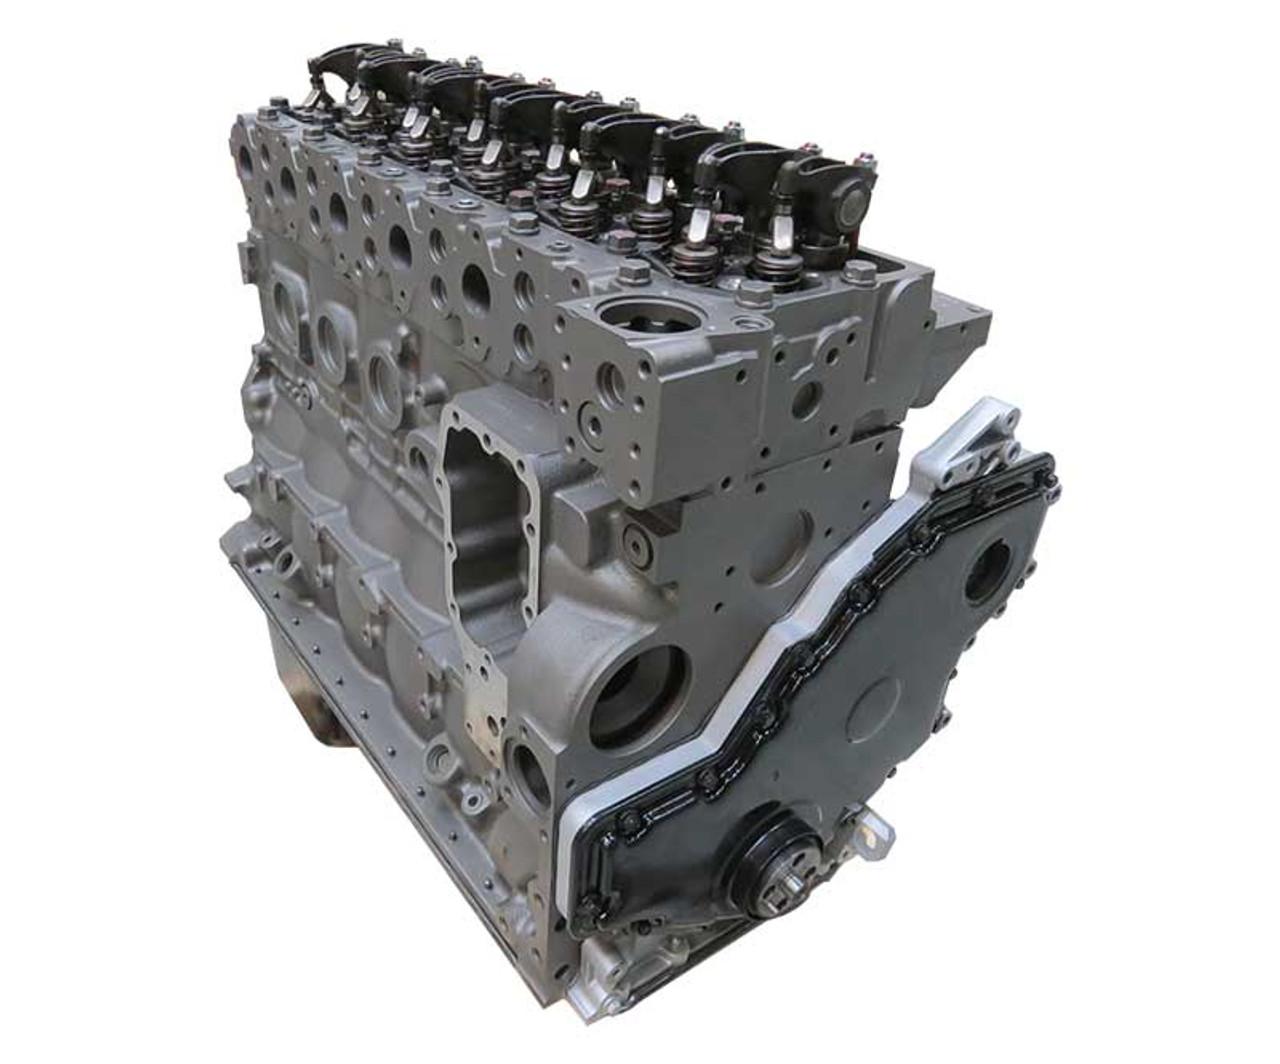 DFC Long Block Remanufacture 2007- 2016 Dodge 6.7 Cummins Engine